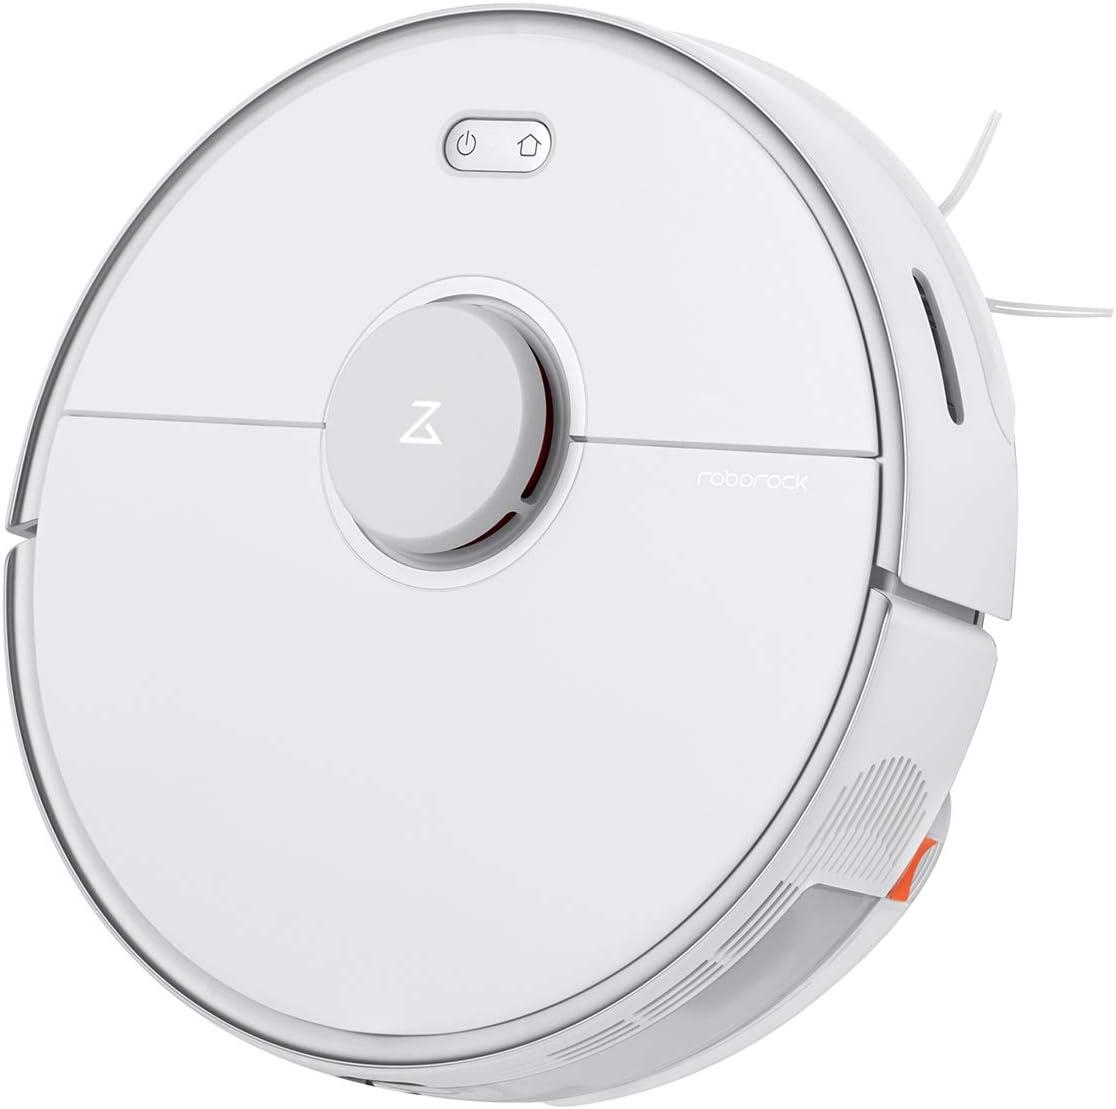 roborock S5 MAX Robot Aspirador, barredora, función de Limpieza, sensores LDS, Control por aplicación (S5 MAX Blanco): Amazon.es: Hogar